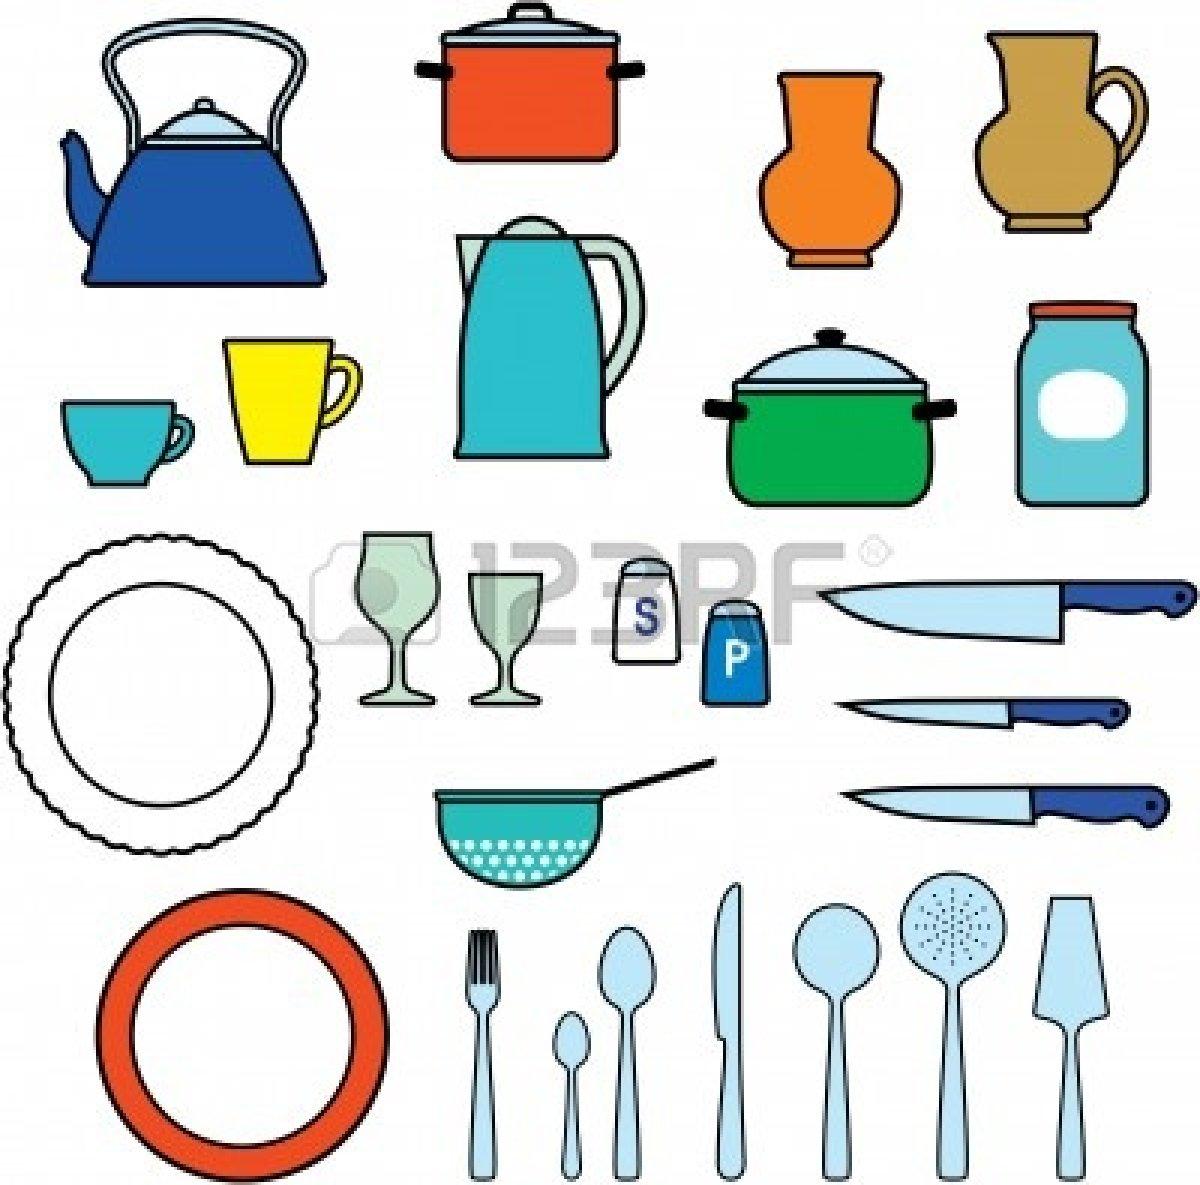 Kitchen tools drawing - Kitchen Tools Drawing Kitchen Tools Drawing Kitchen Utensils Drawing For Kids Cooking 20utensils 20drawing Download